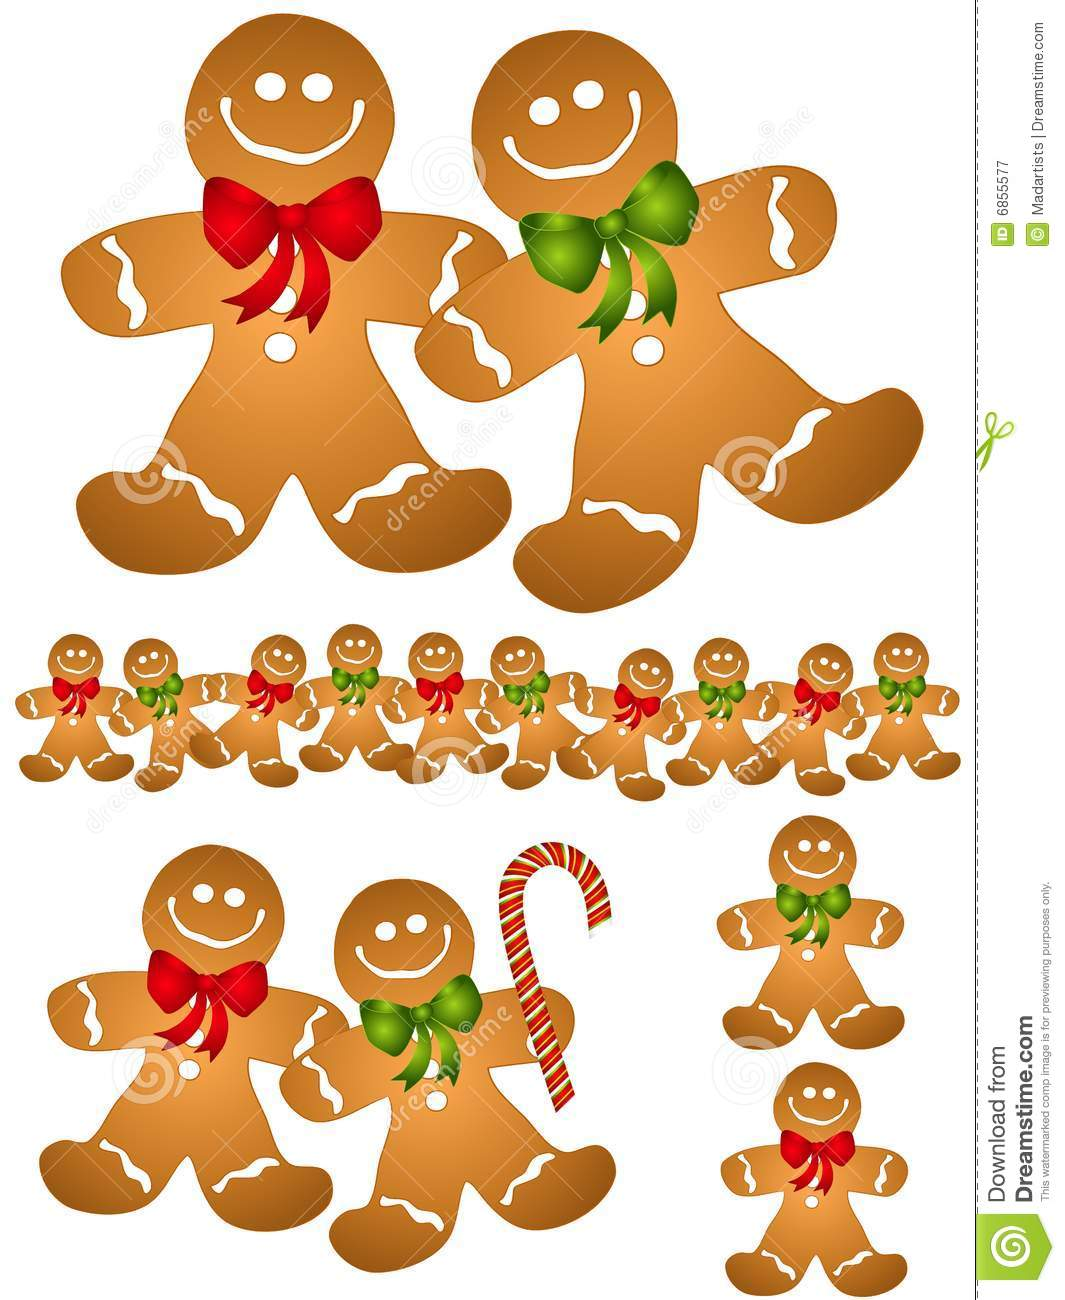 Gingerbread Men Clip Art stock vector. Illustration of christmas.